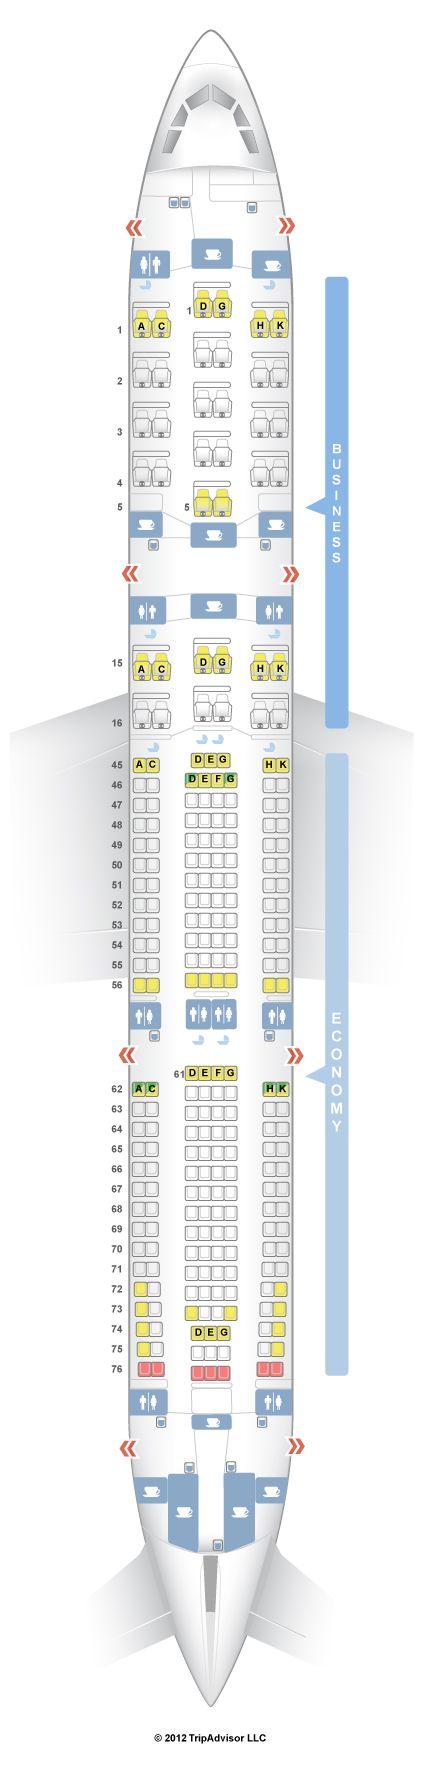 SeatGuru Seat Map South African Airways Airbus A340-300 (343)